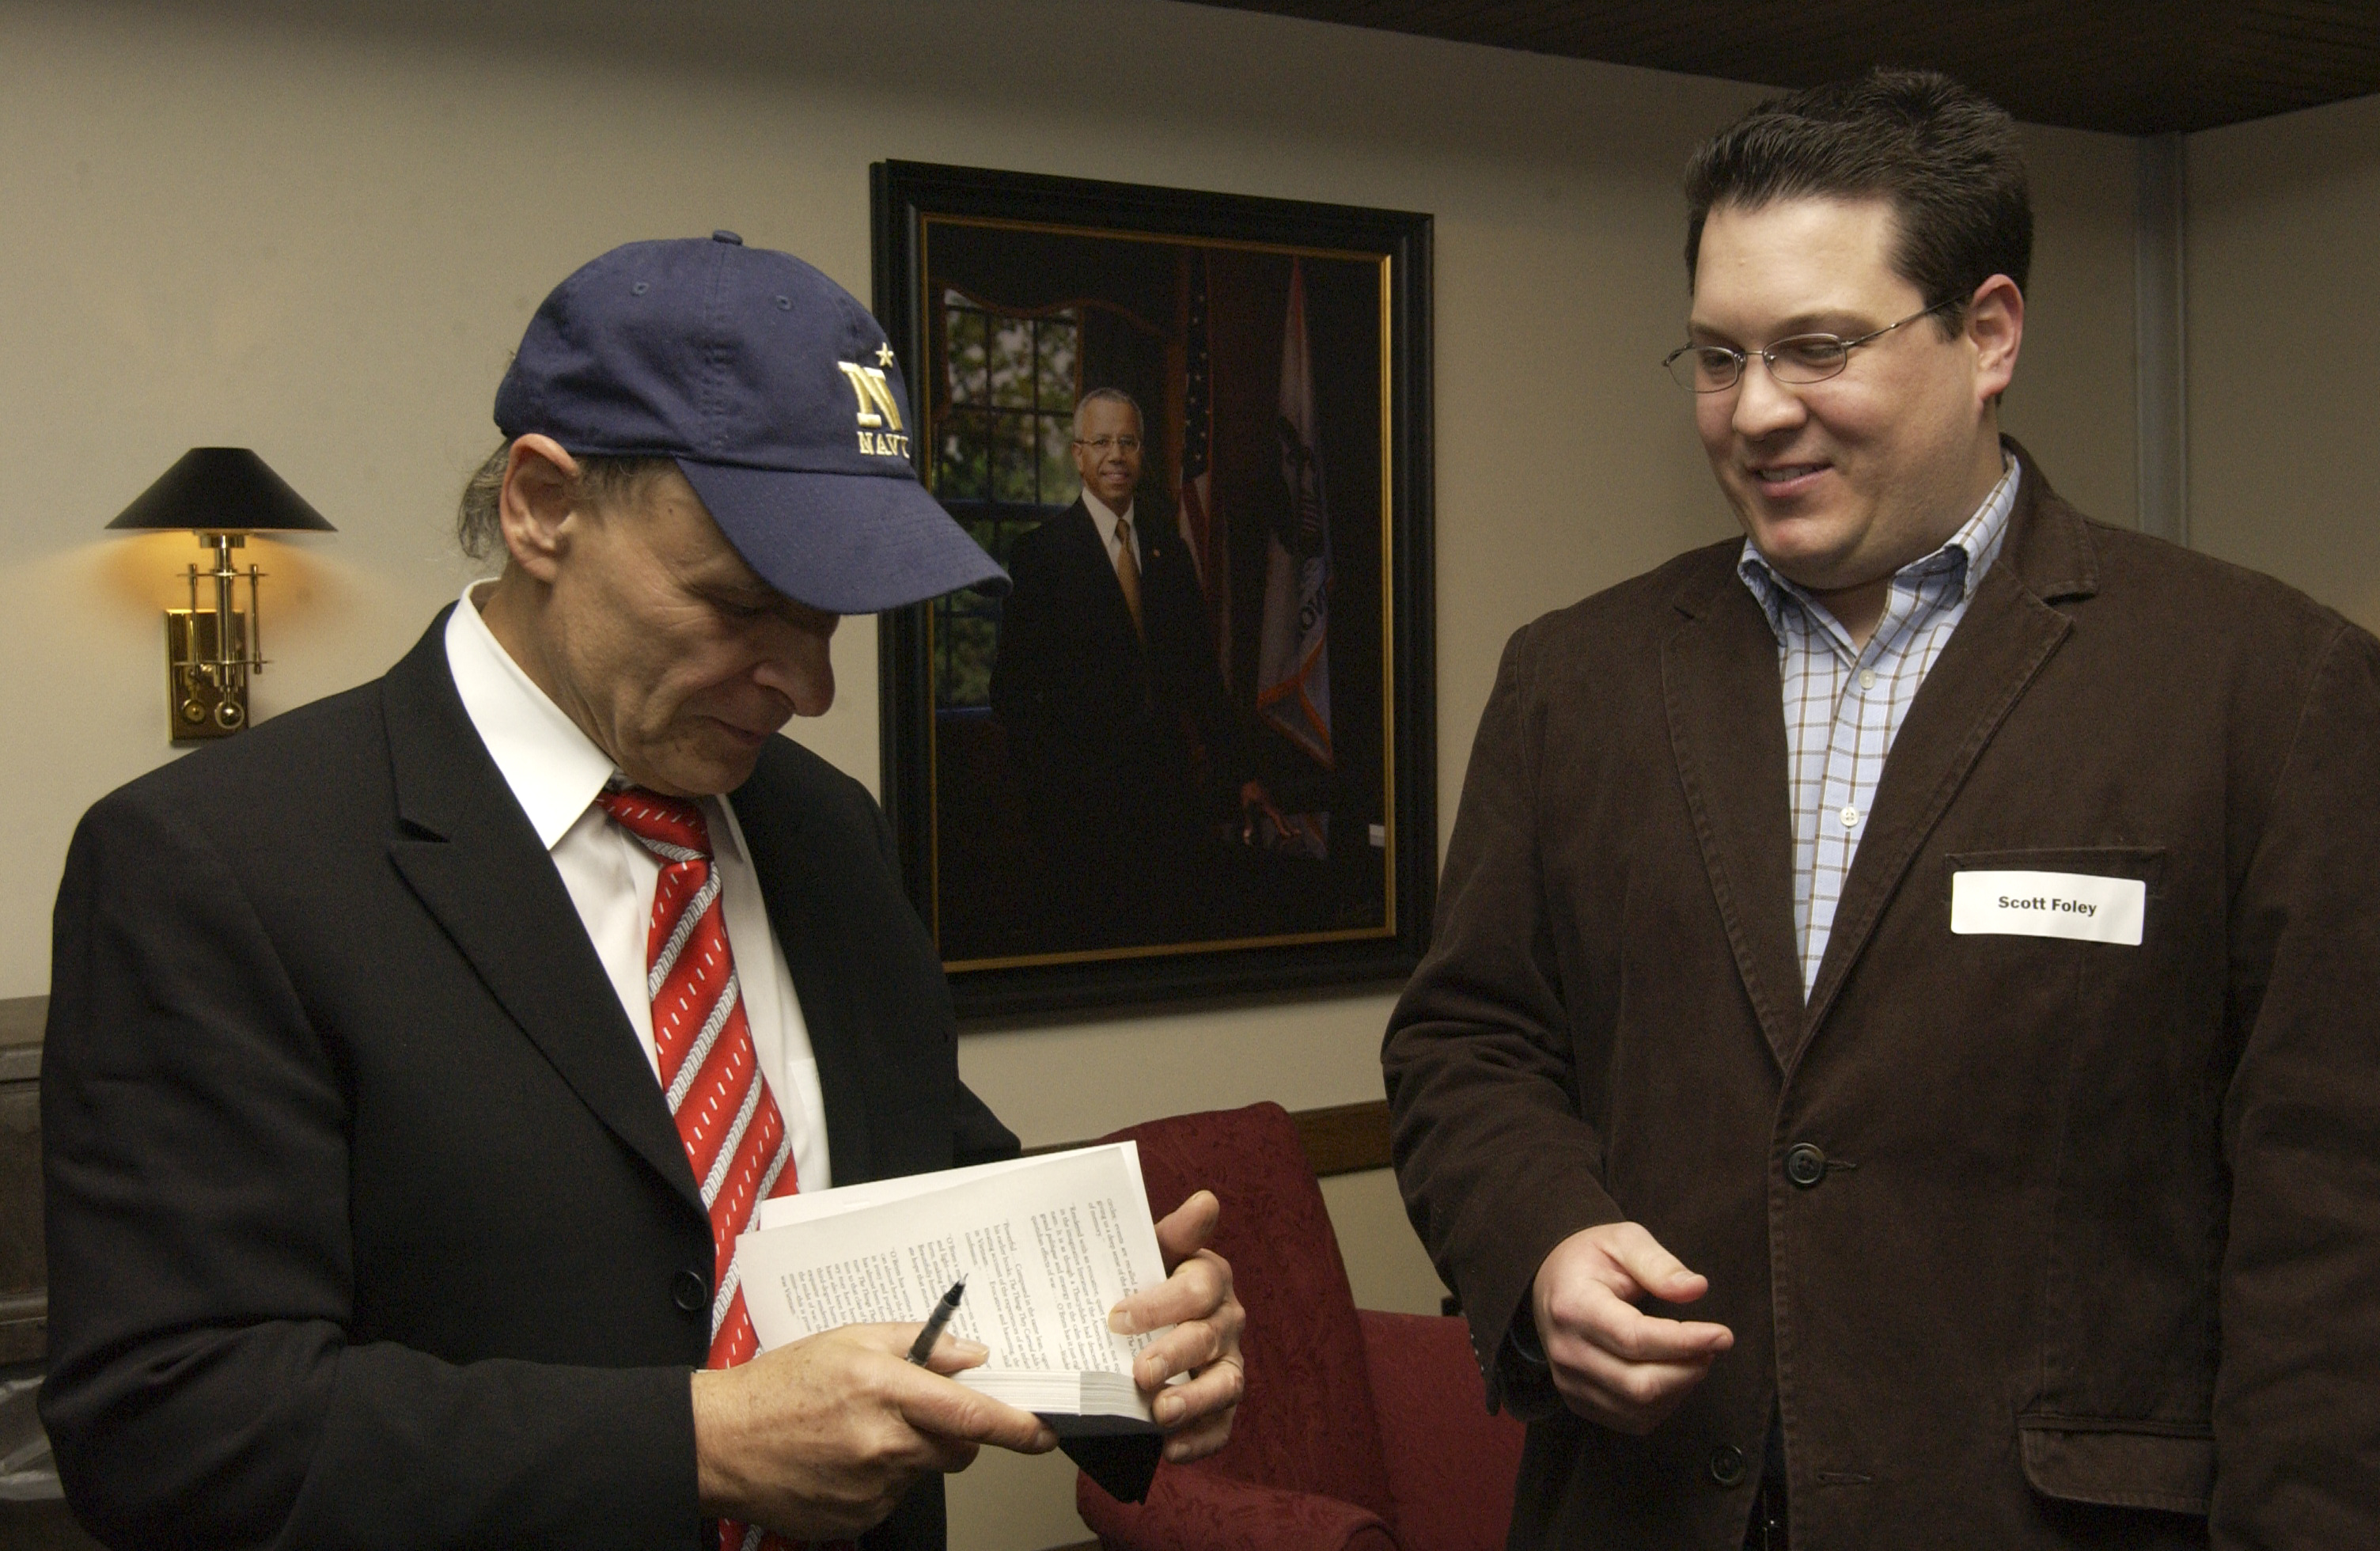 Tim O'Brien Signs ScottWilliam Foley's Book